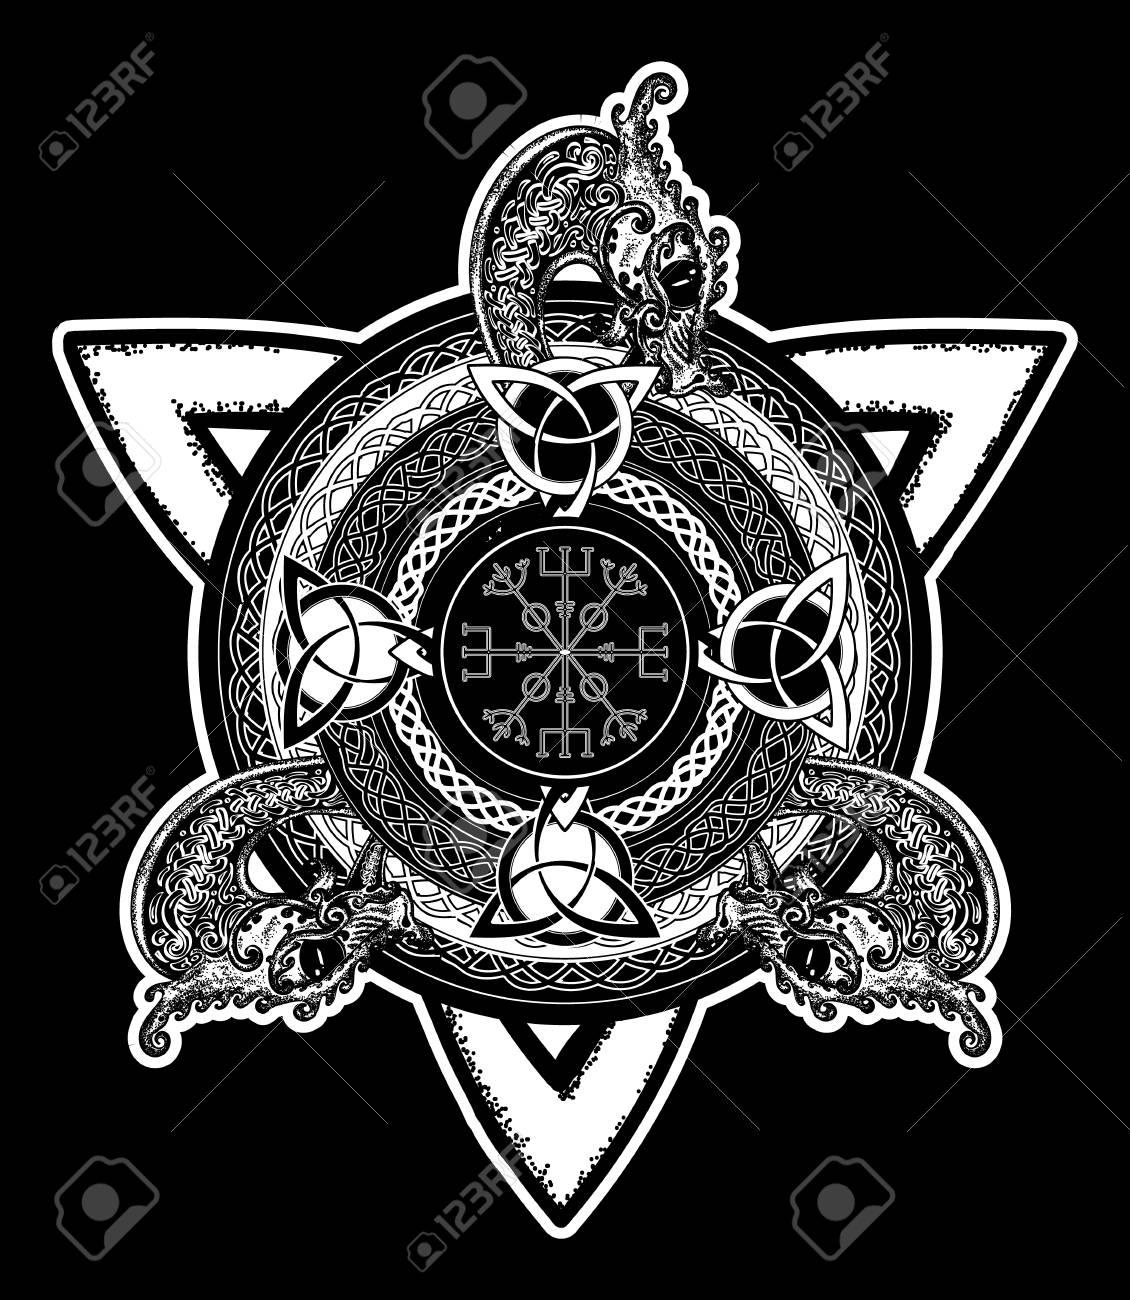 Celtic cross tattoo art and t shirt design dragons symbol of celtic cross tattoo art and t shirt design dragons symbol of the viking biocorpaavc Gallery